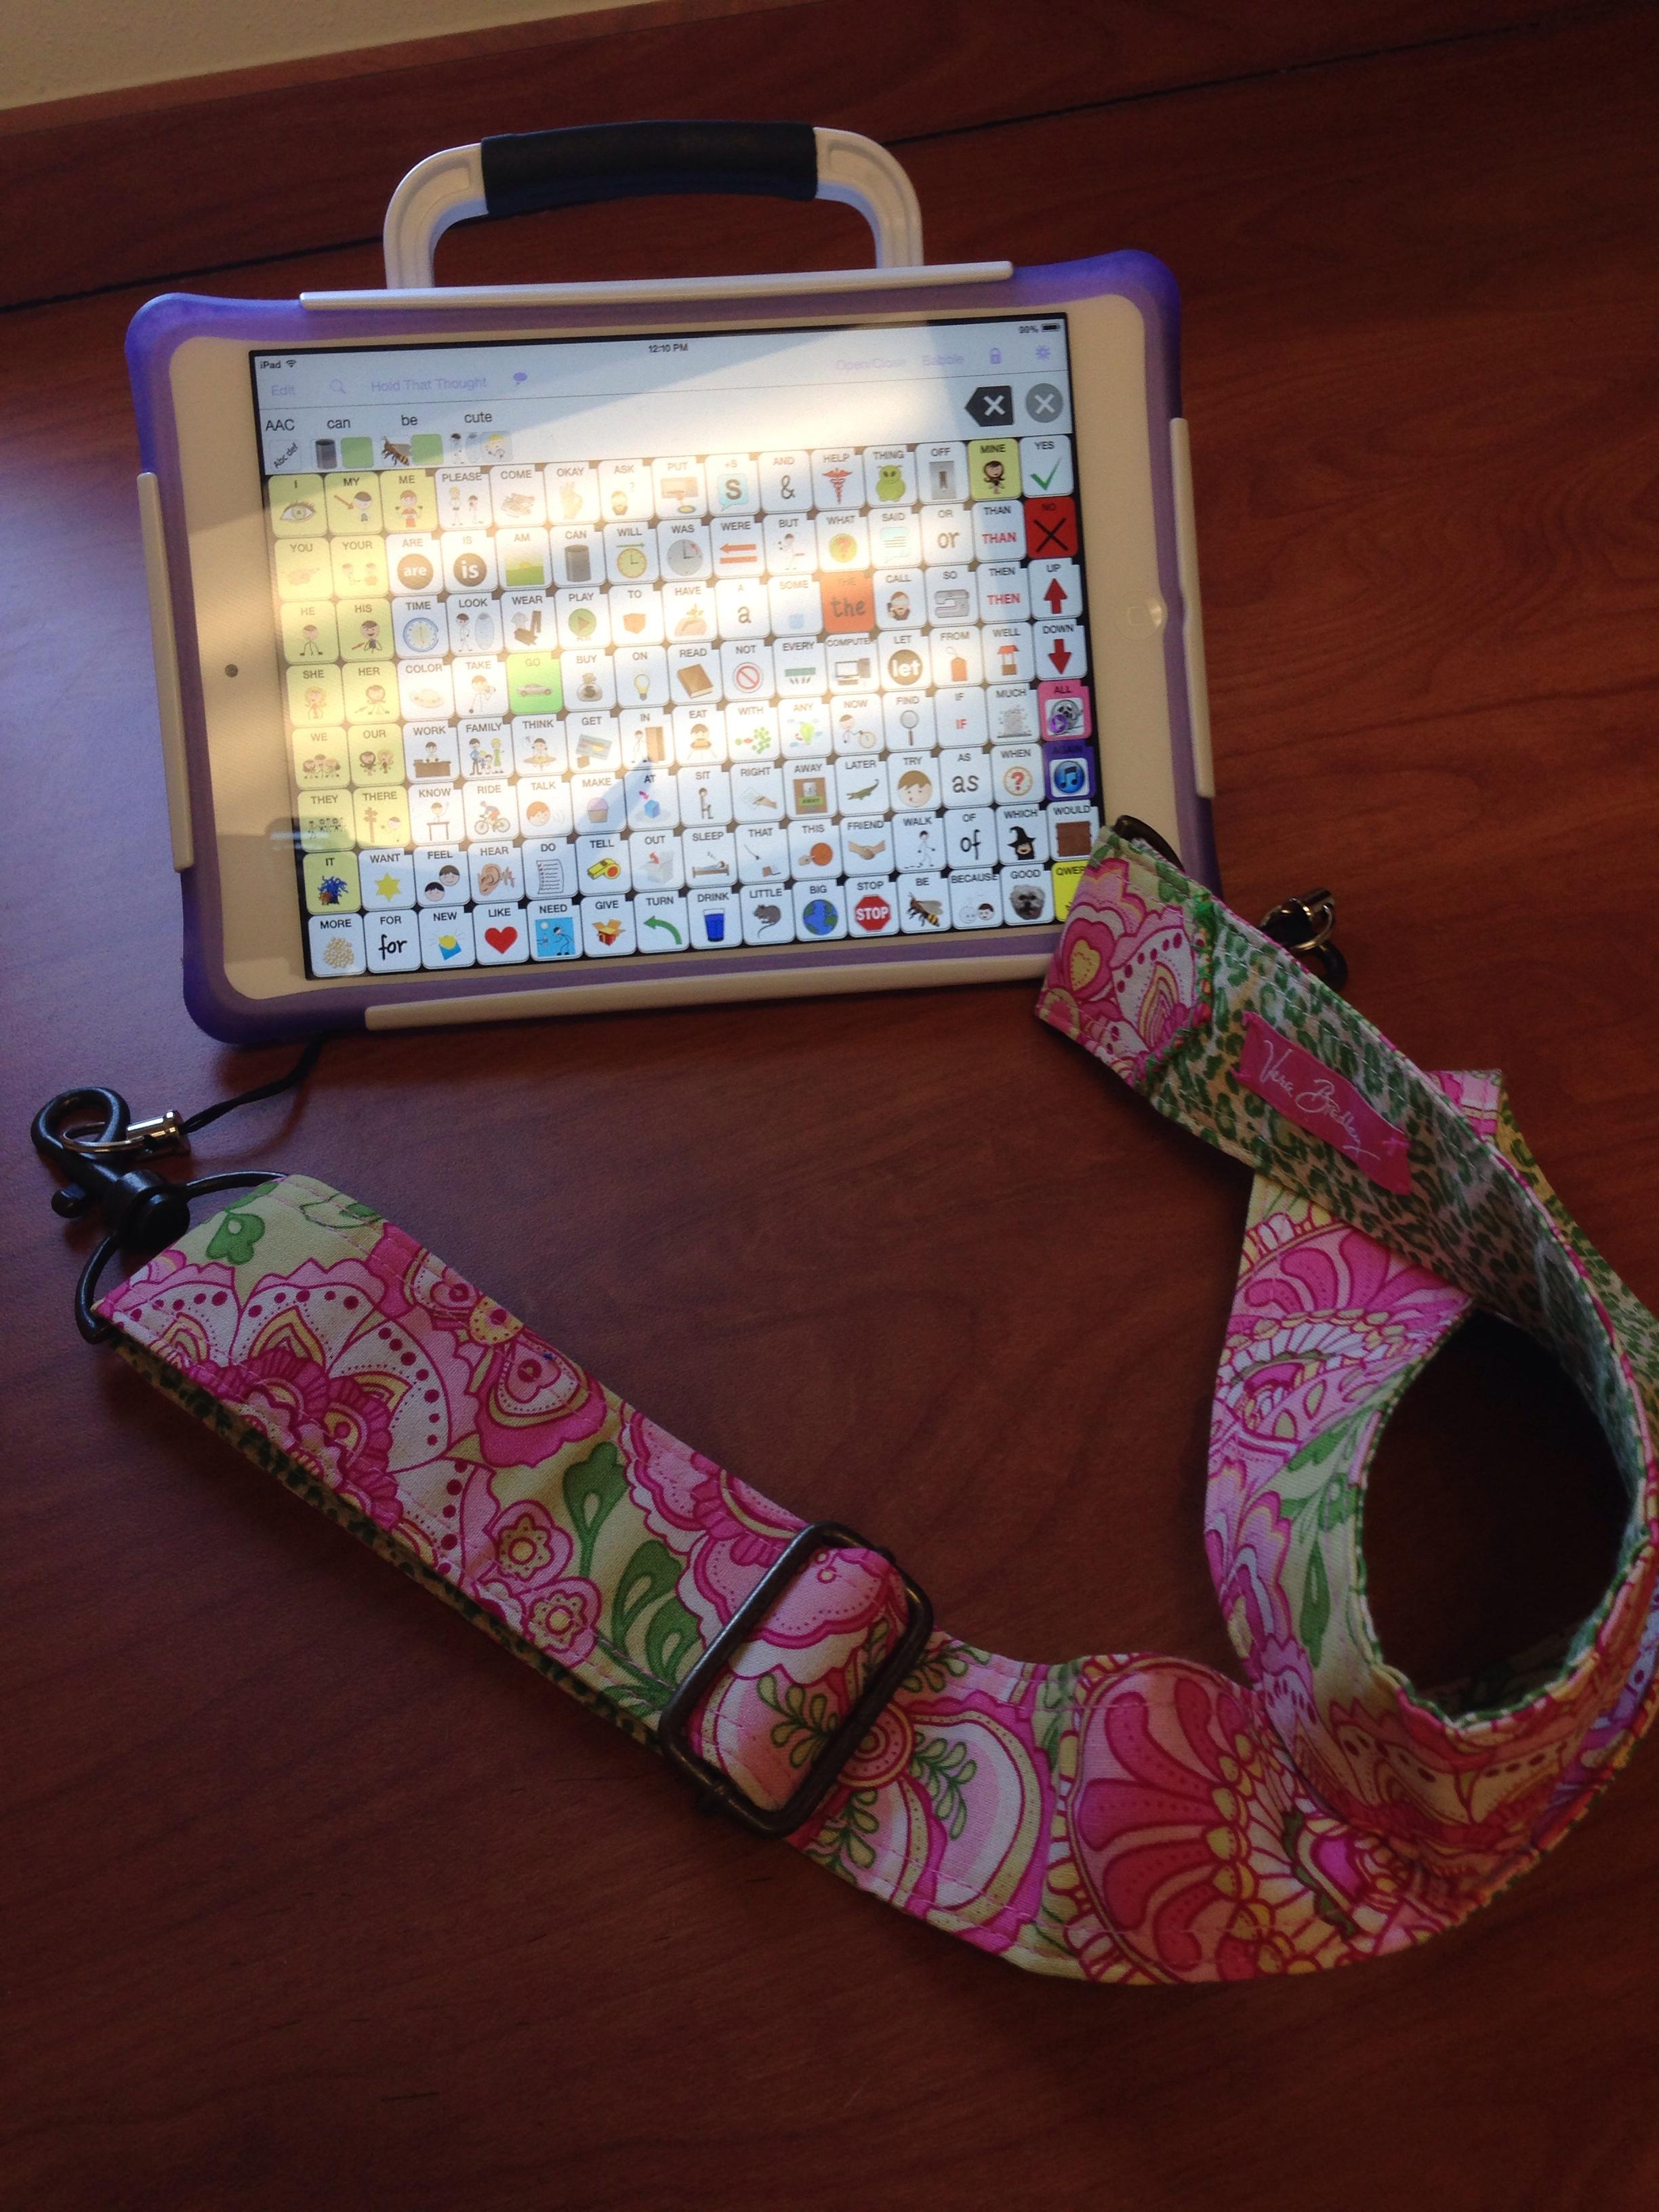 Chatwrap Case For Ipad Mini Omazing Kids Wiring Harness Vera Bradley Aac Strap